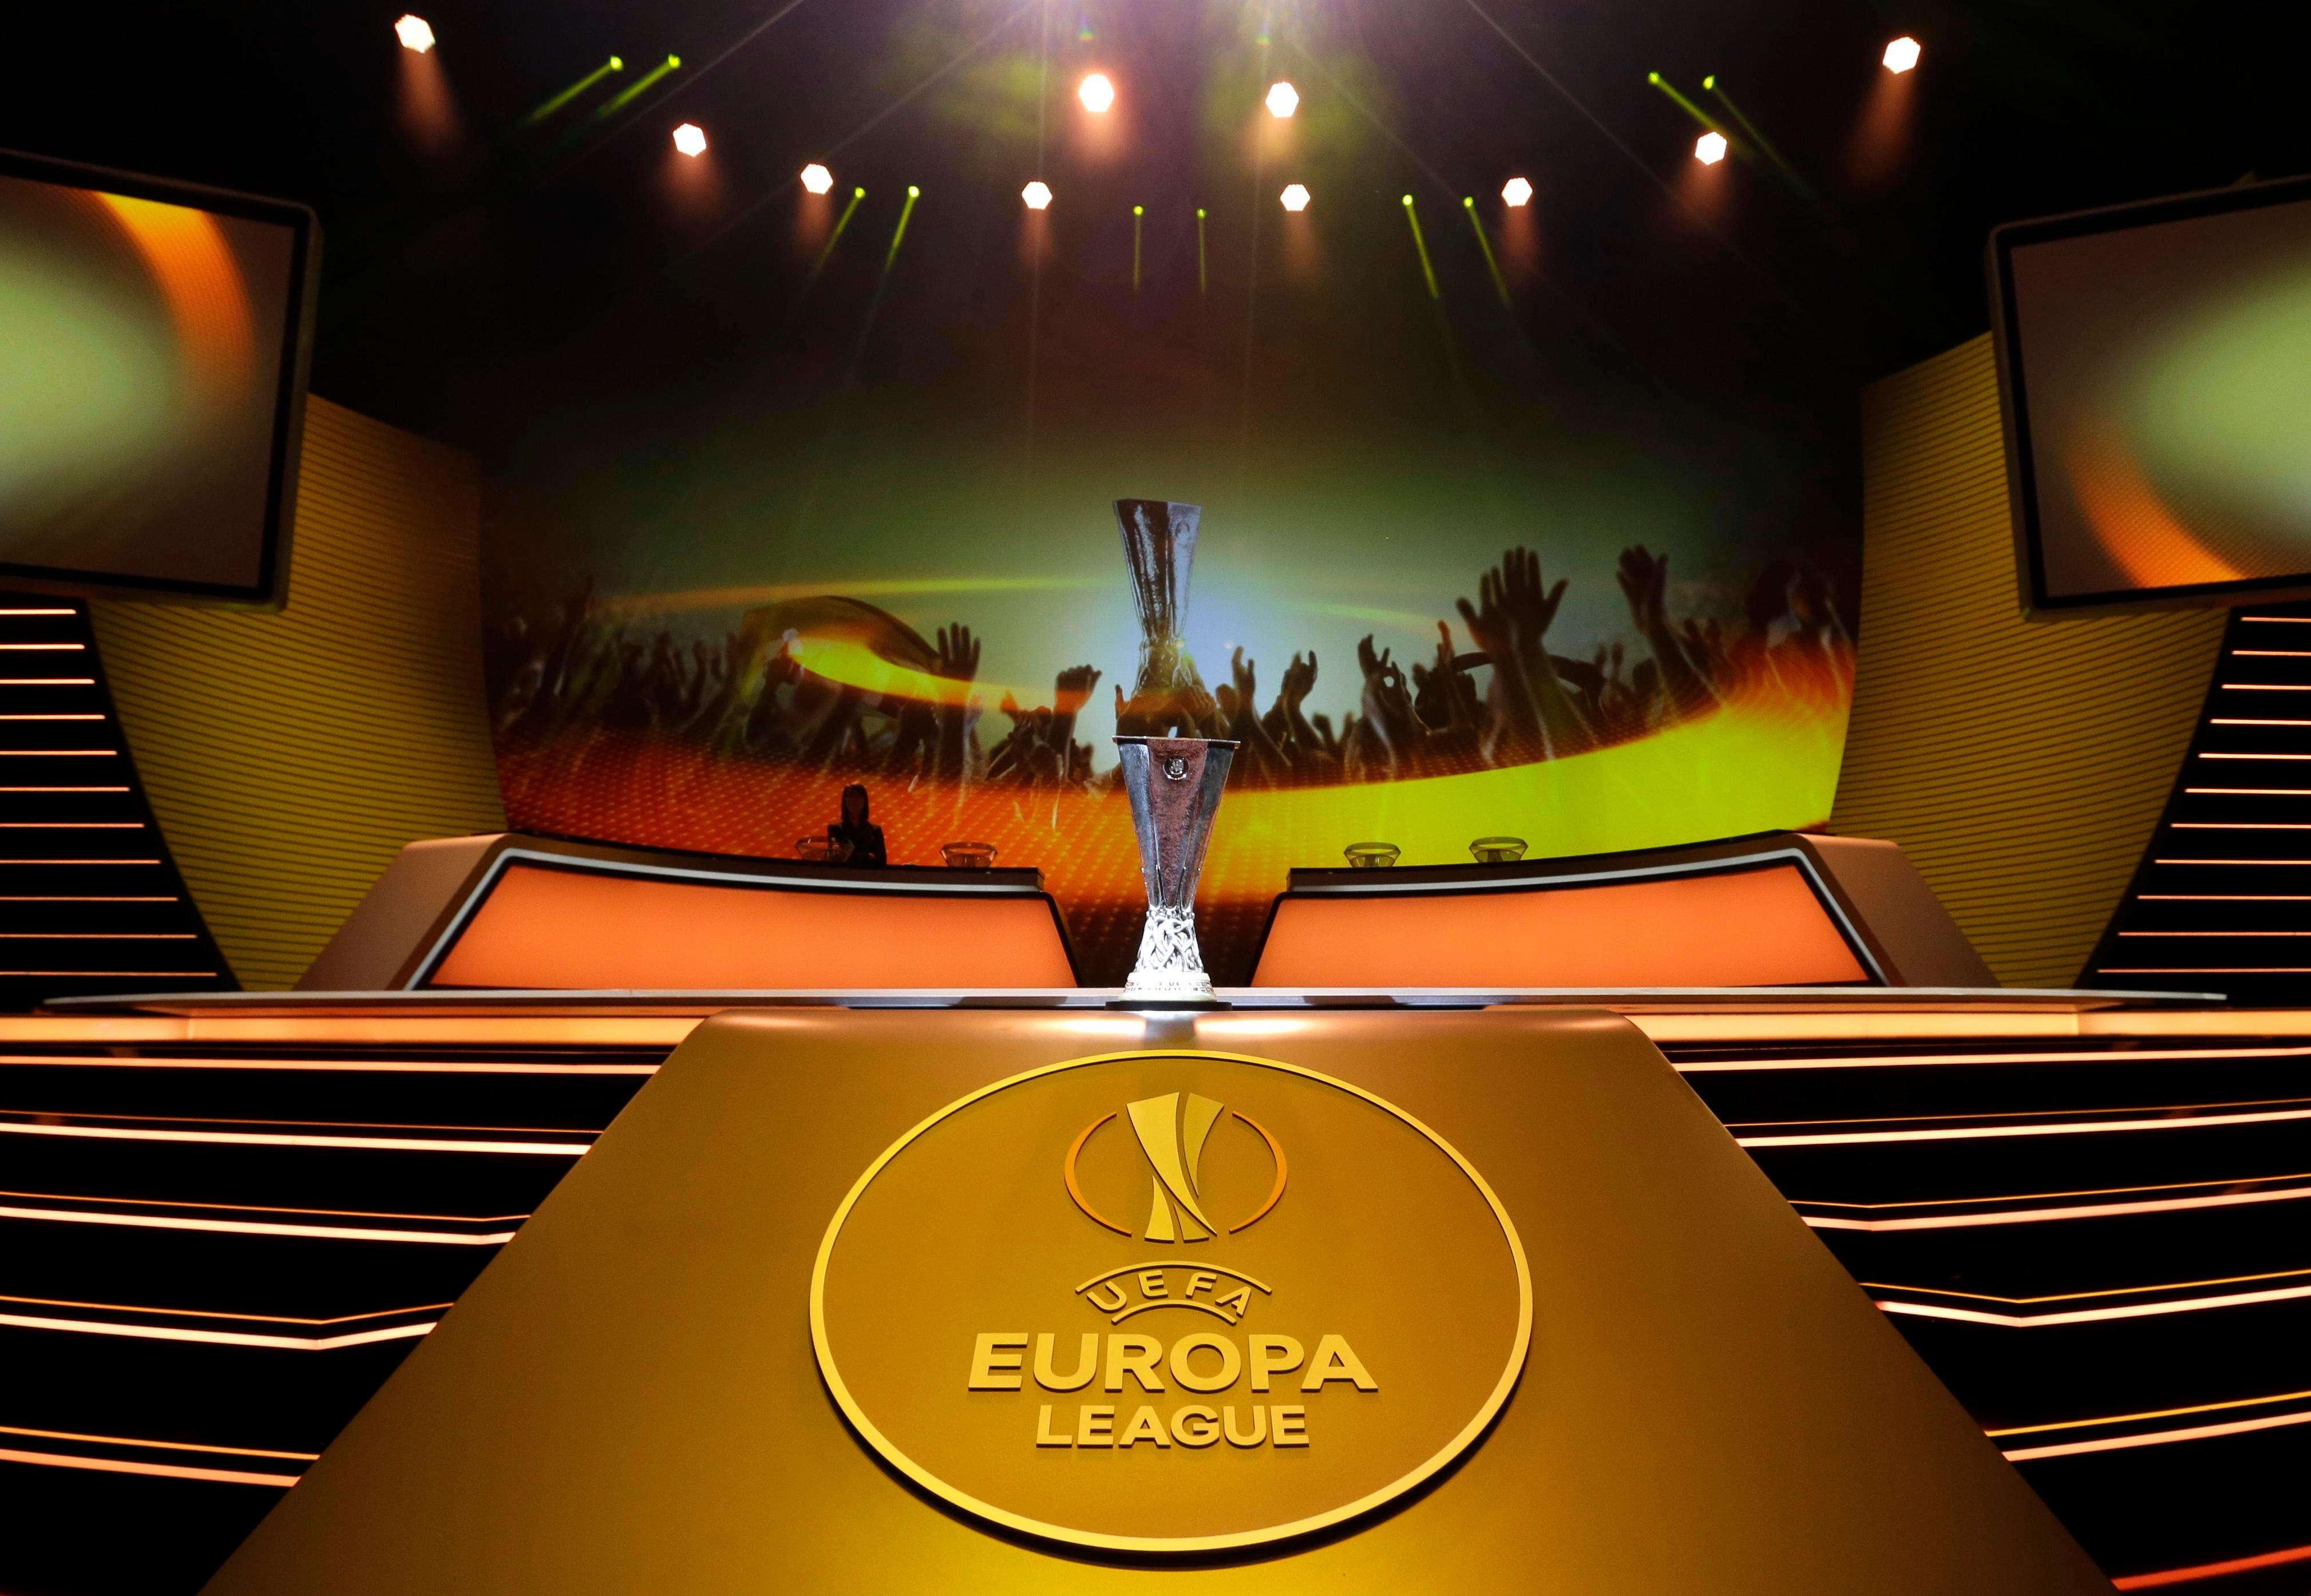 Hasil Undian Perempat Final Liga Eropa 2018/2019